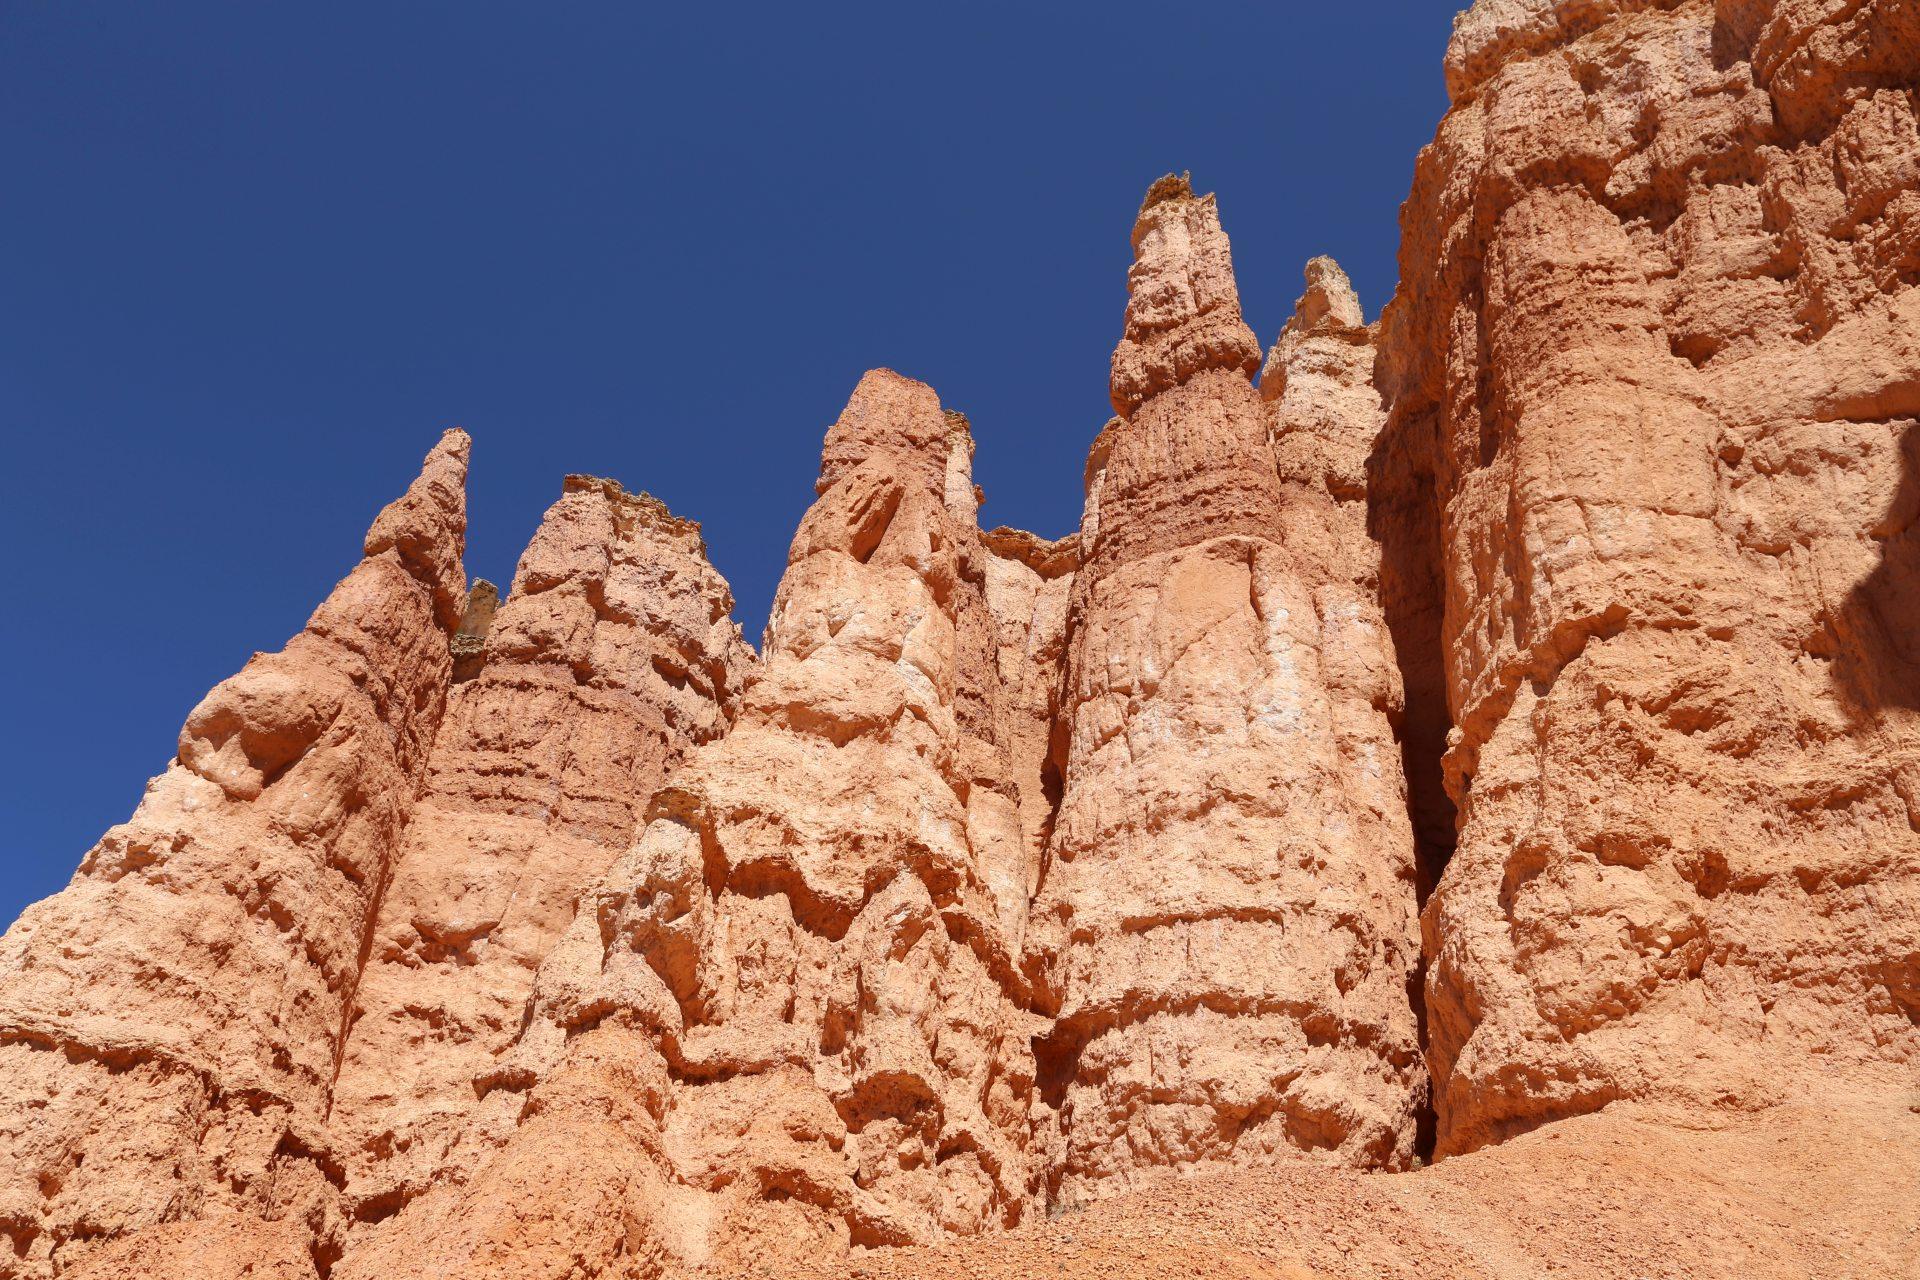 Sandsteinerne Felswächter - Bryce Canyon National Park, Canyon, Erosion, farbenfroh, Felsnadeln, Felstürme, Geologie, Gestein, Gesteinssäulen, Gesteinsschichten, Himmel, Hoodoos, Monolithen, Queens Garden Trail, Sandstein, Utah - (Bryce Canyon, Bryce, Utah, Vereinigte Staaten)